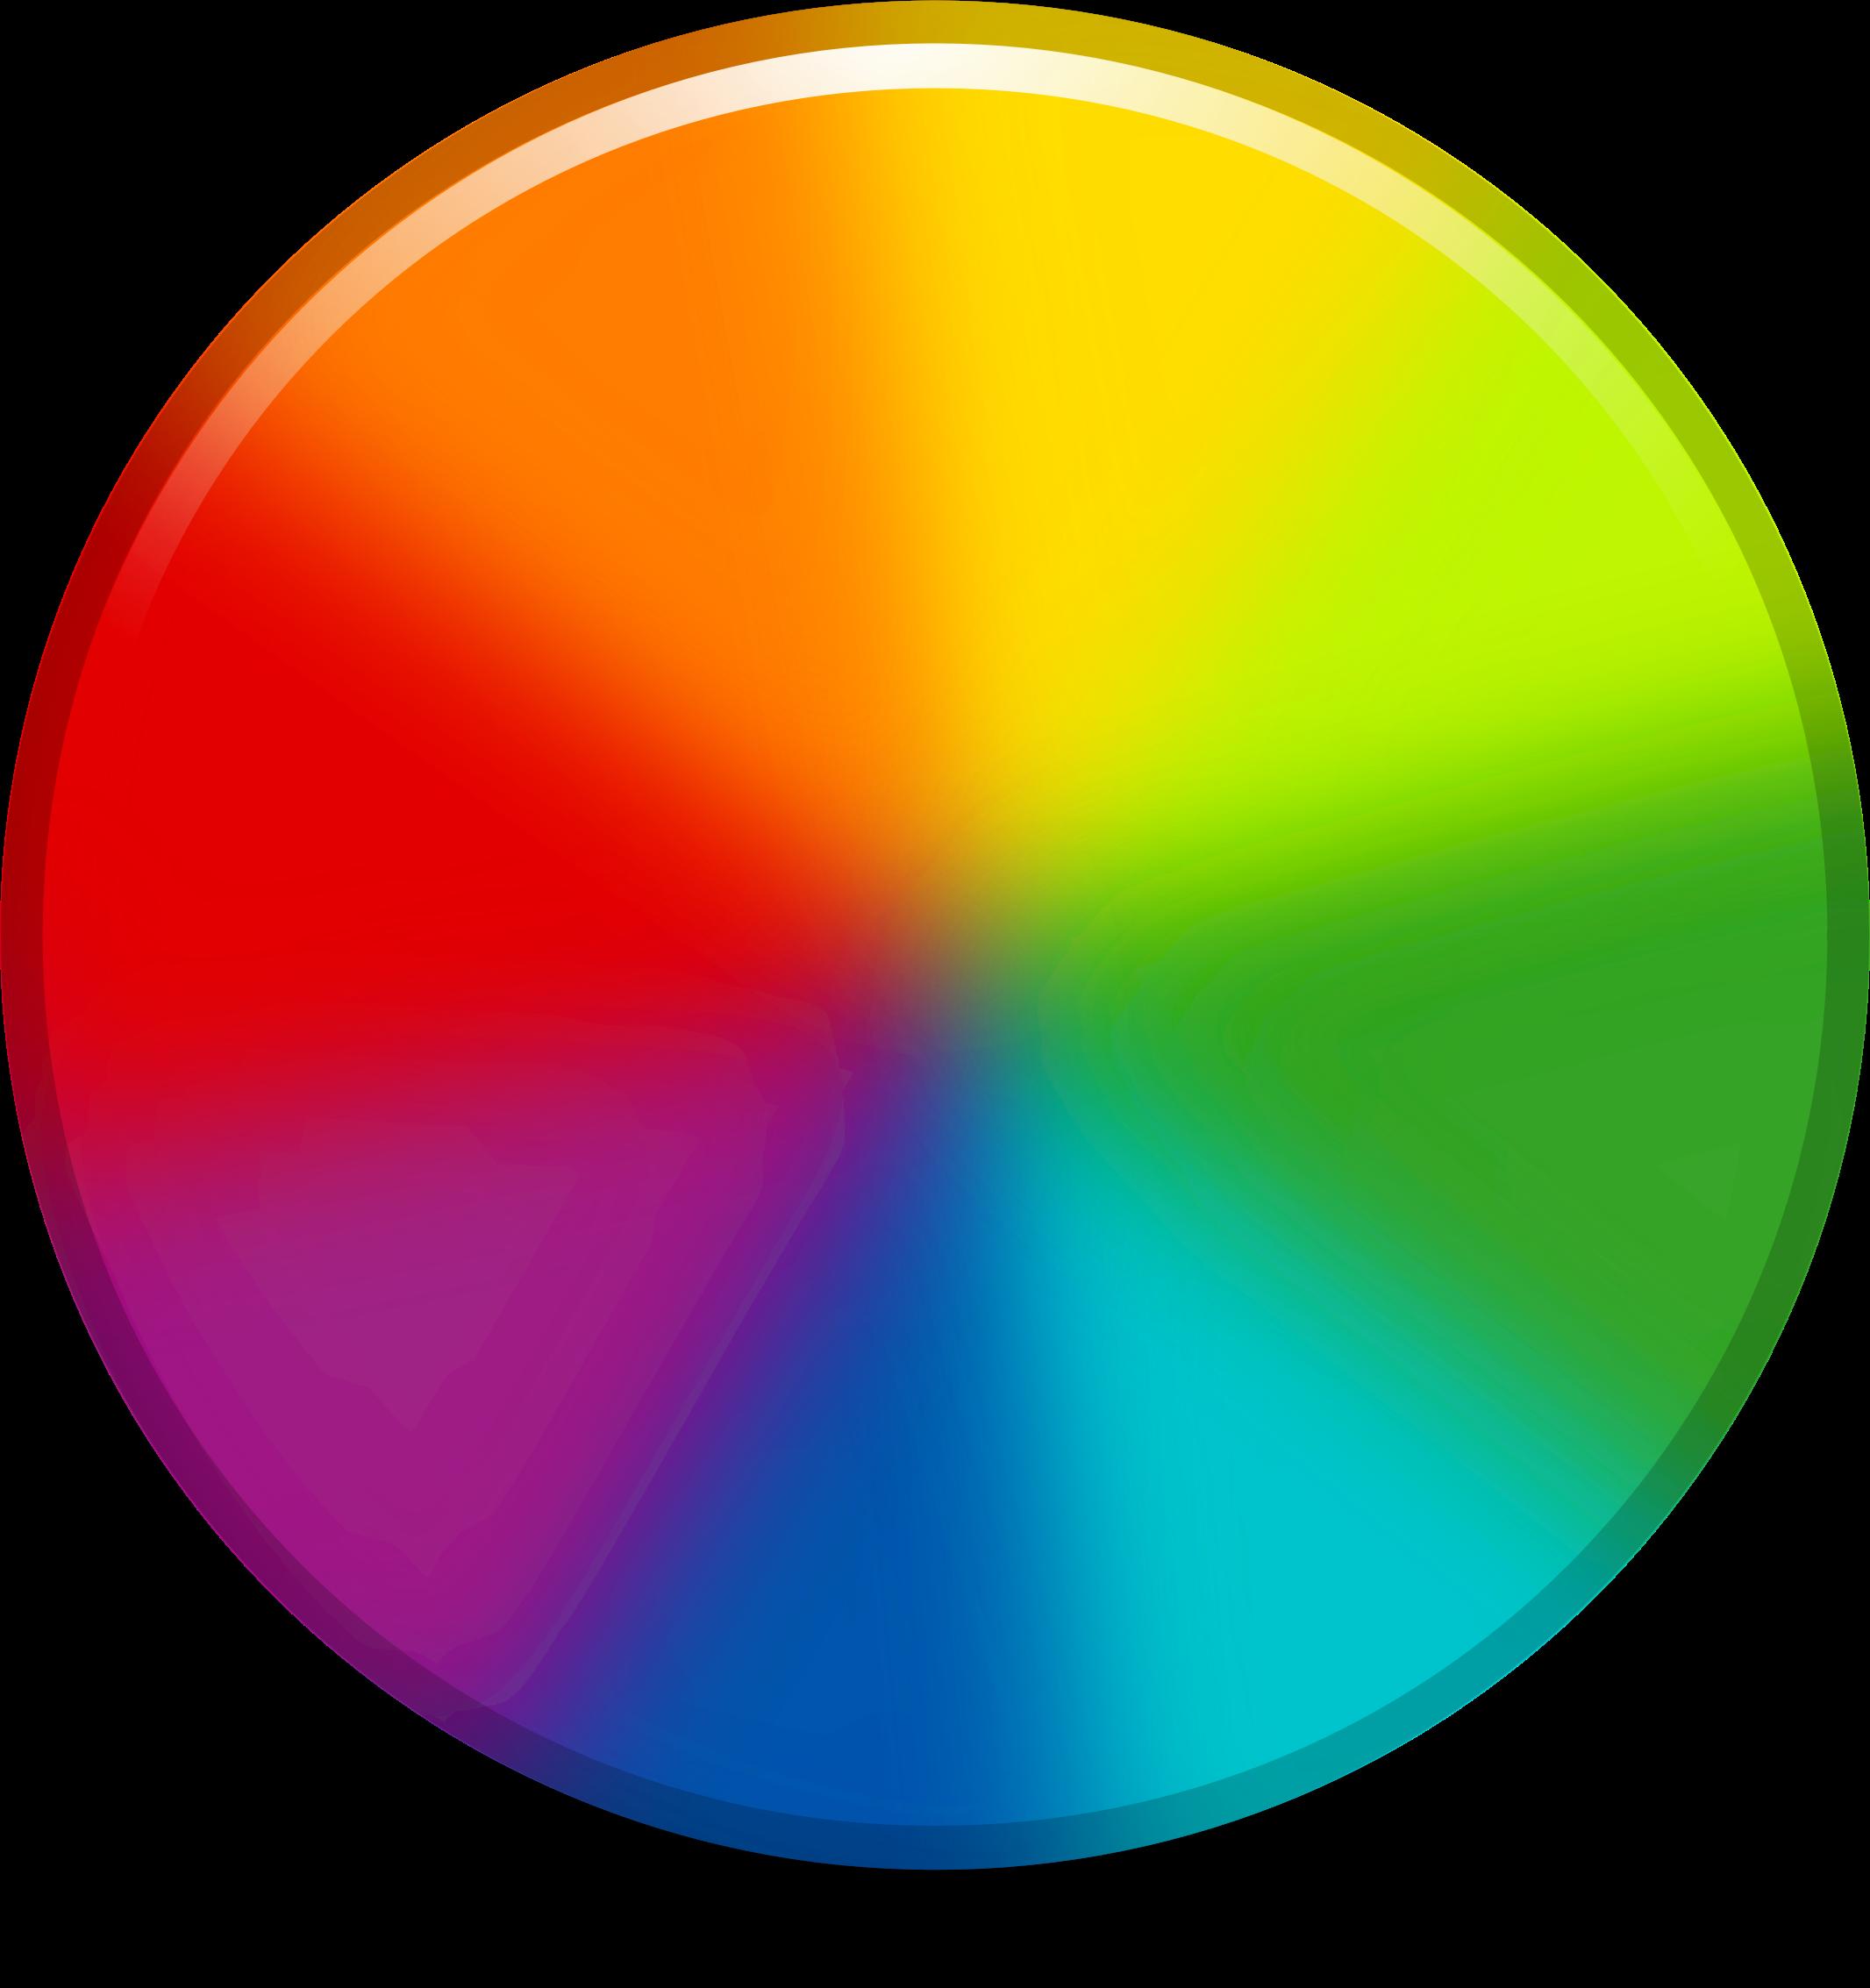 jpg transparent Colorwheel big image png. Color wheel clipart